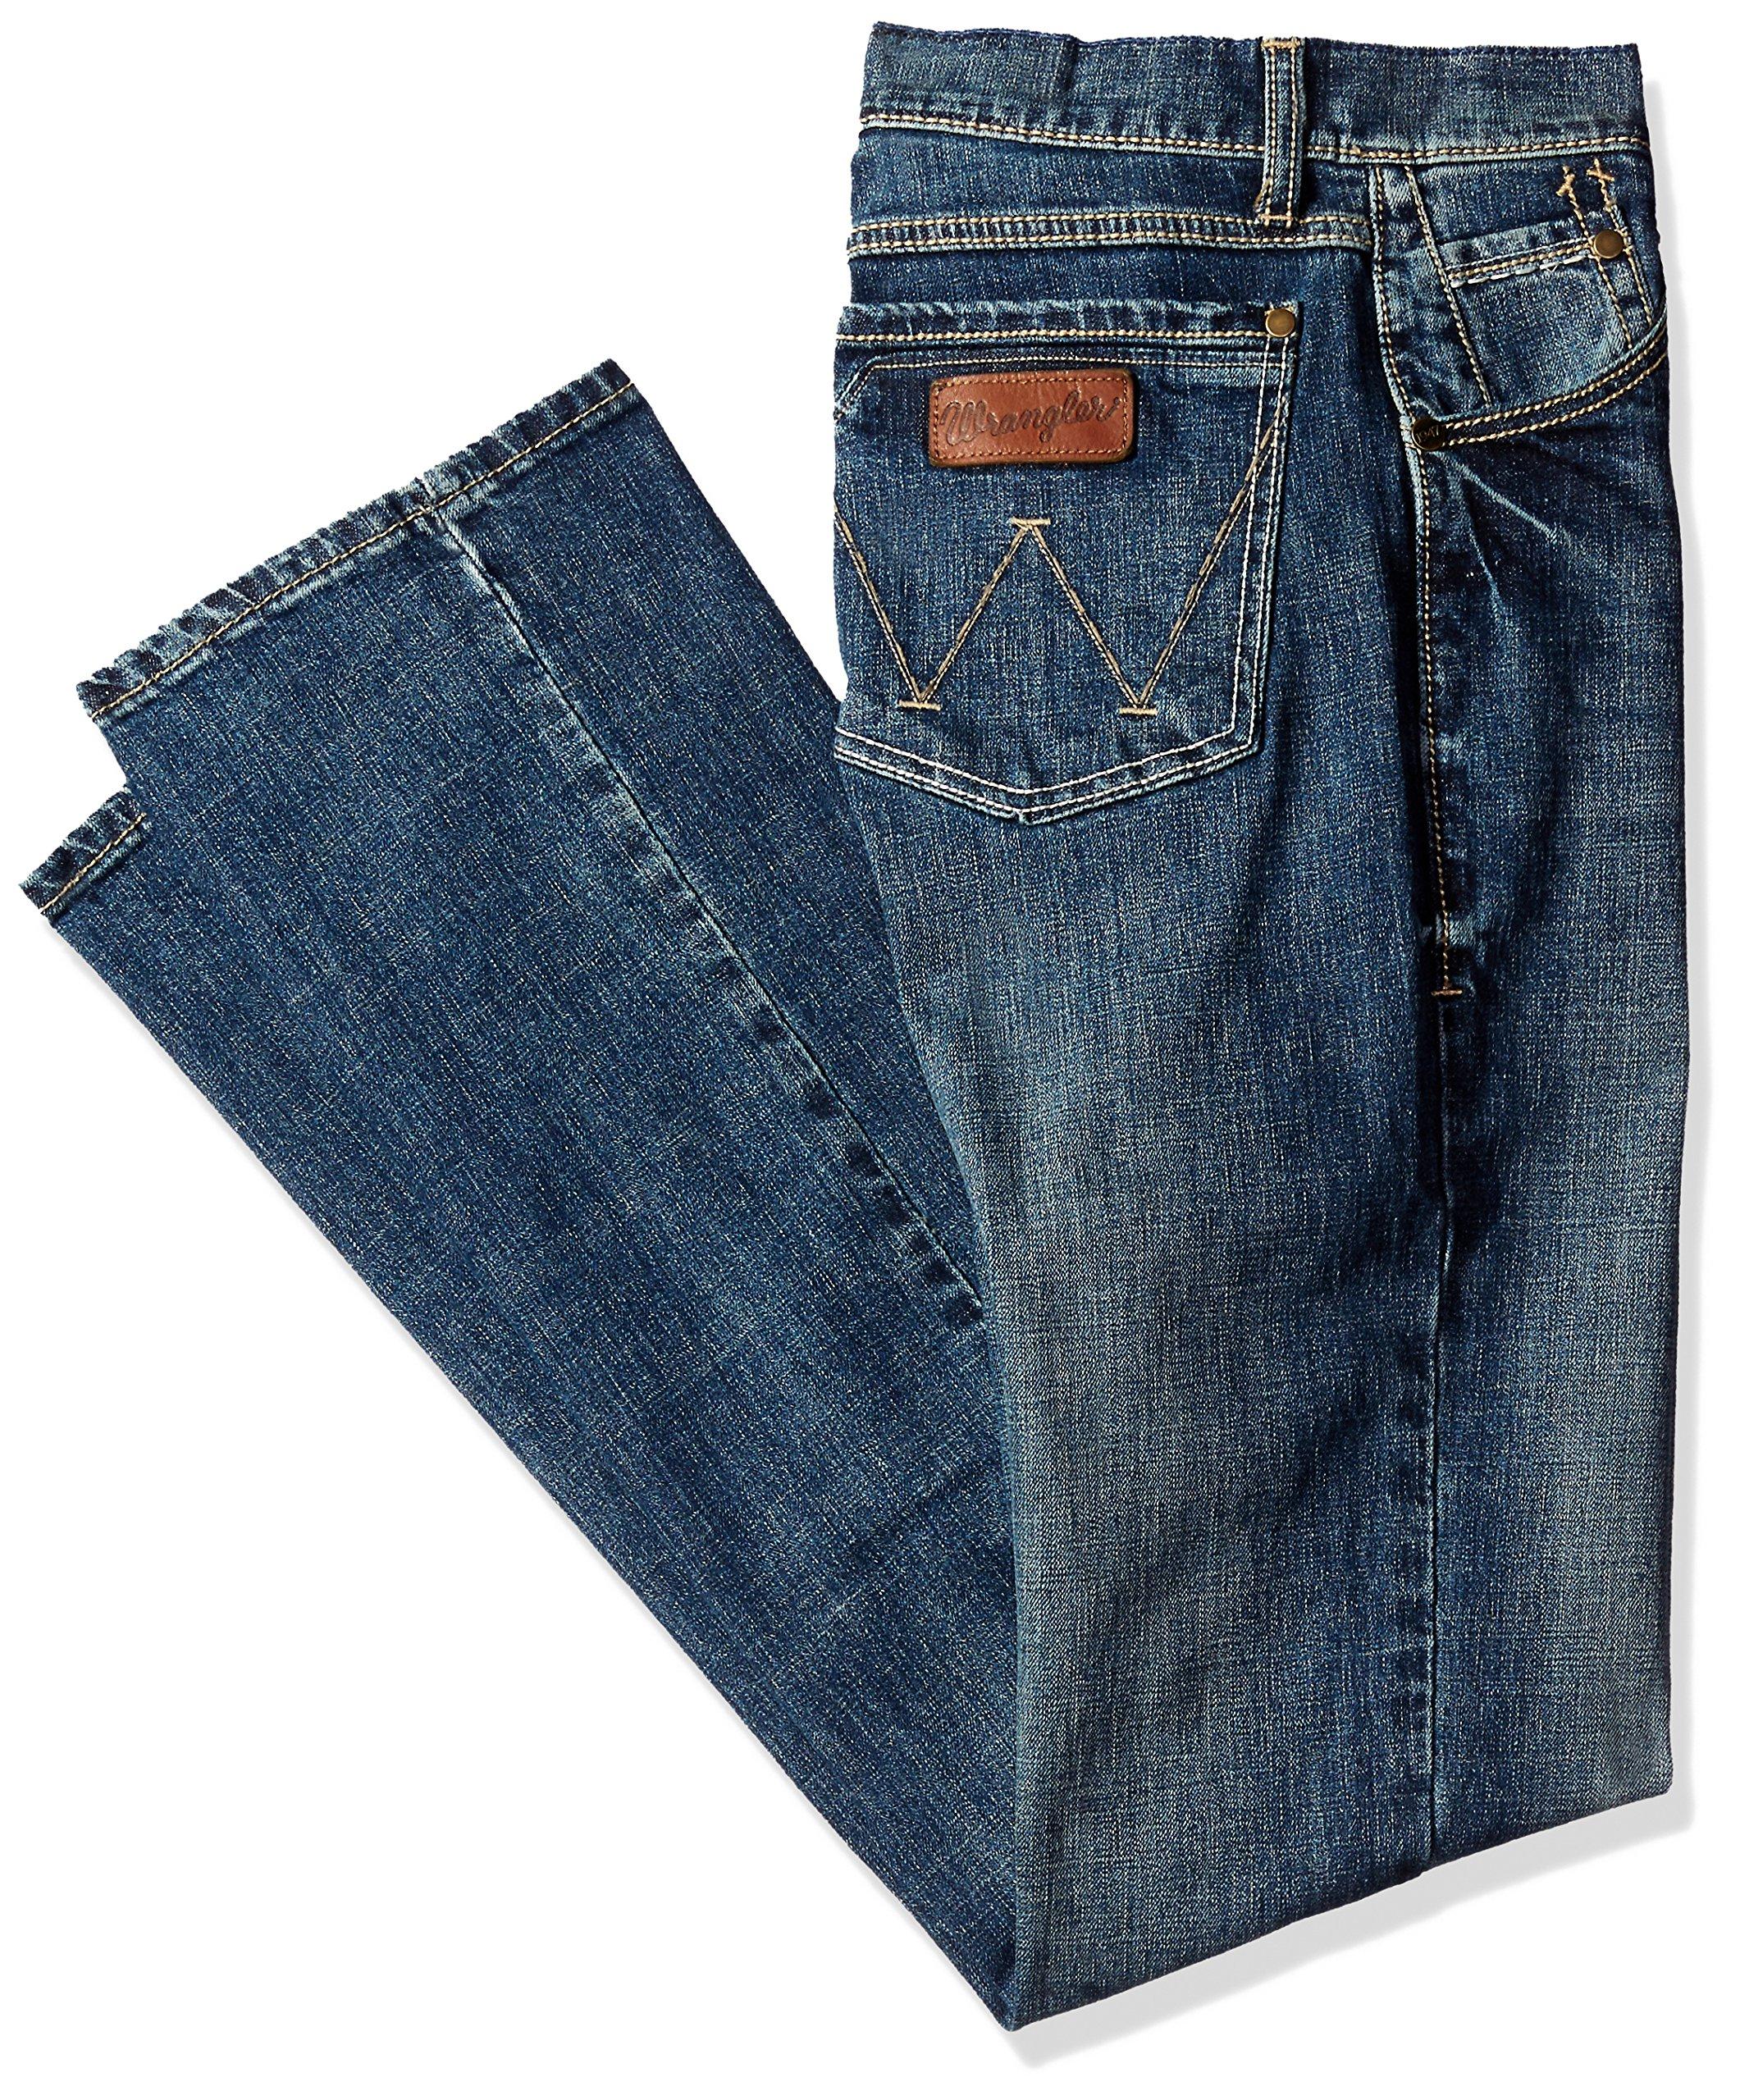 Wrangler Men's Tall Size Retro Slim Fit Boot Cut Jean, Layton, 34x38